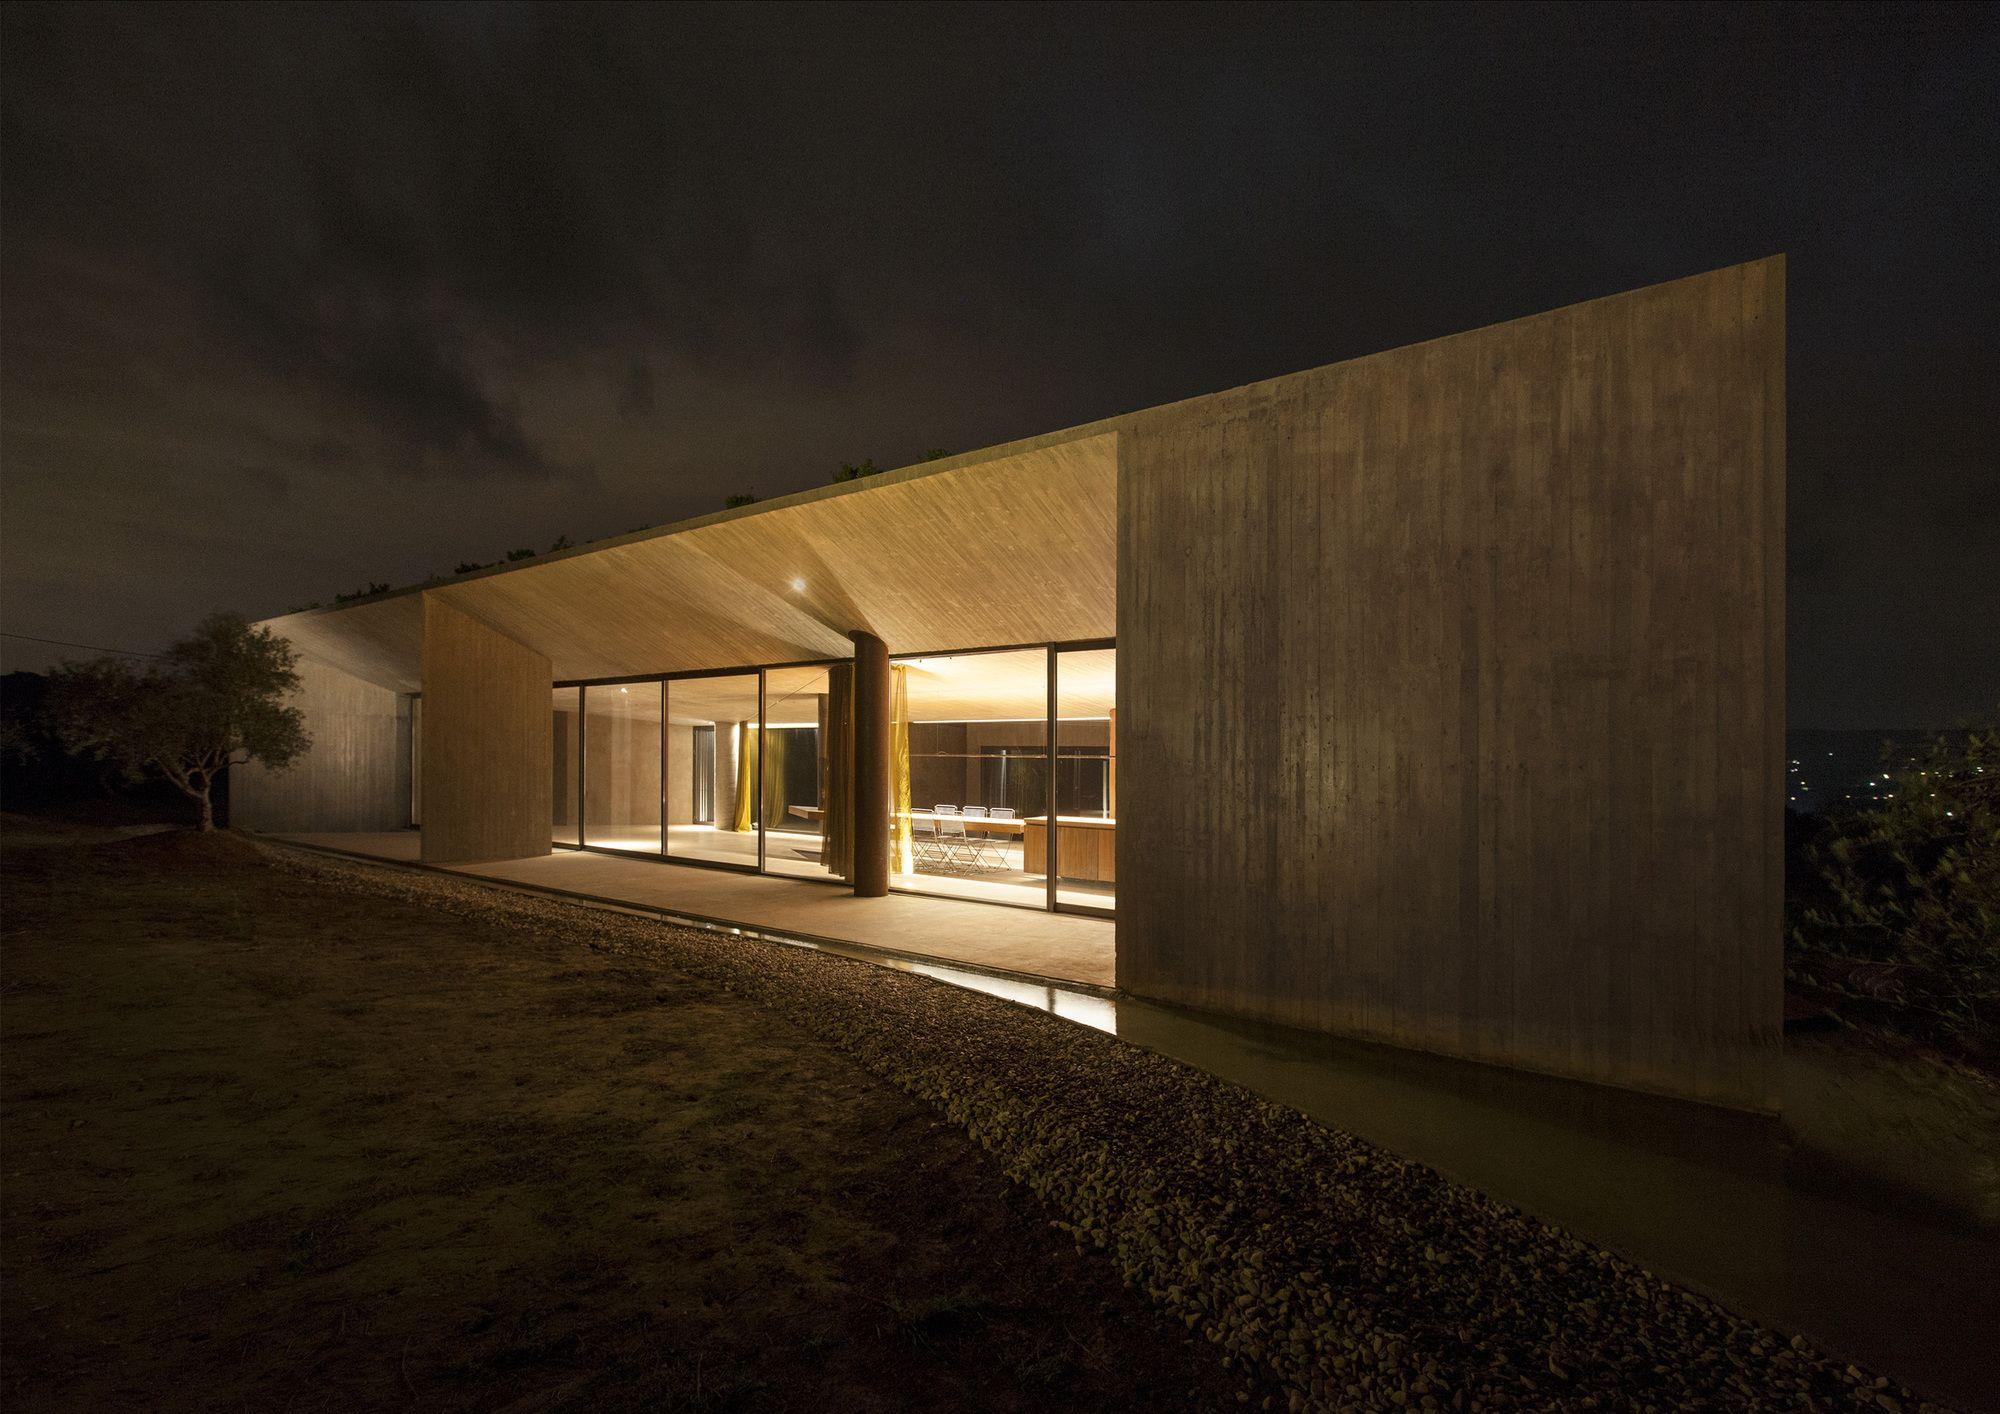 Galería - Residencia en Megara / Tense Architecture Network - 11